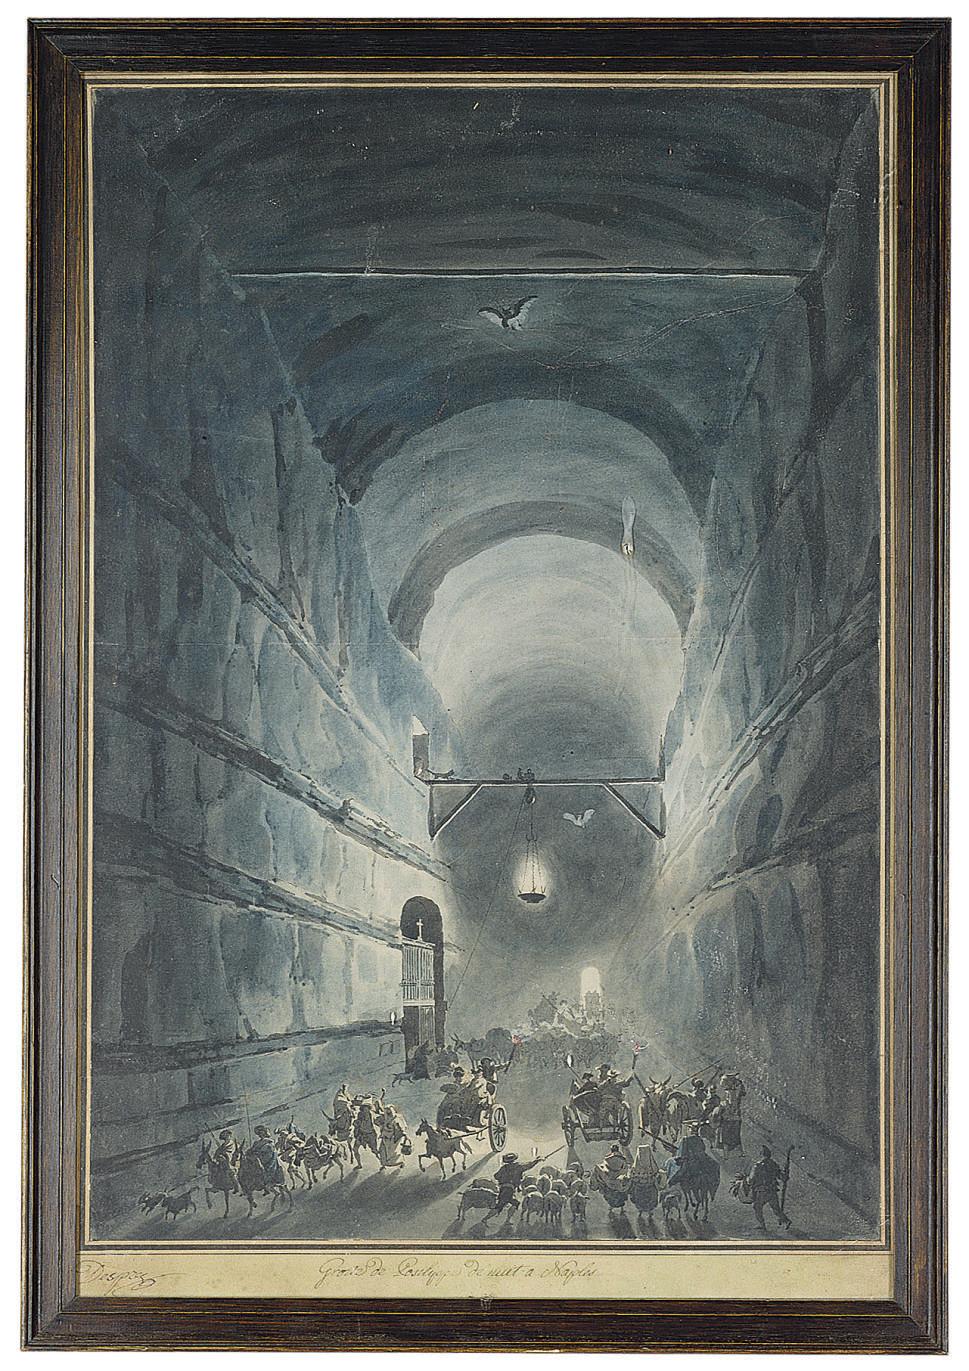 The Grotto of Posillipo, Naples